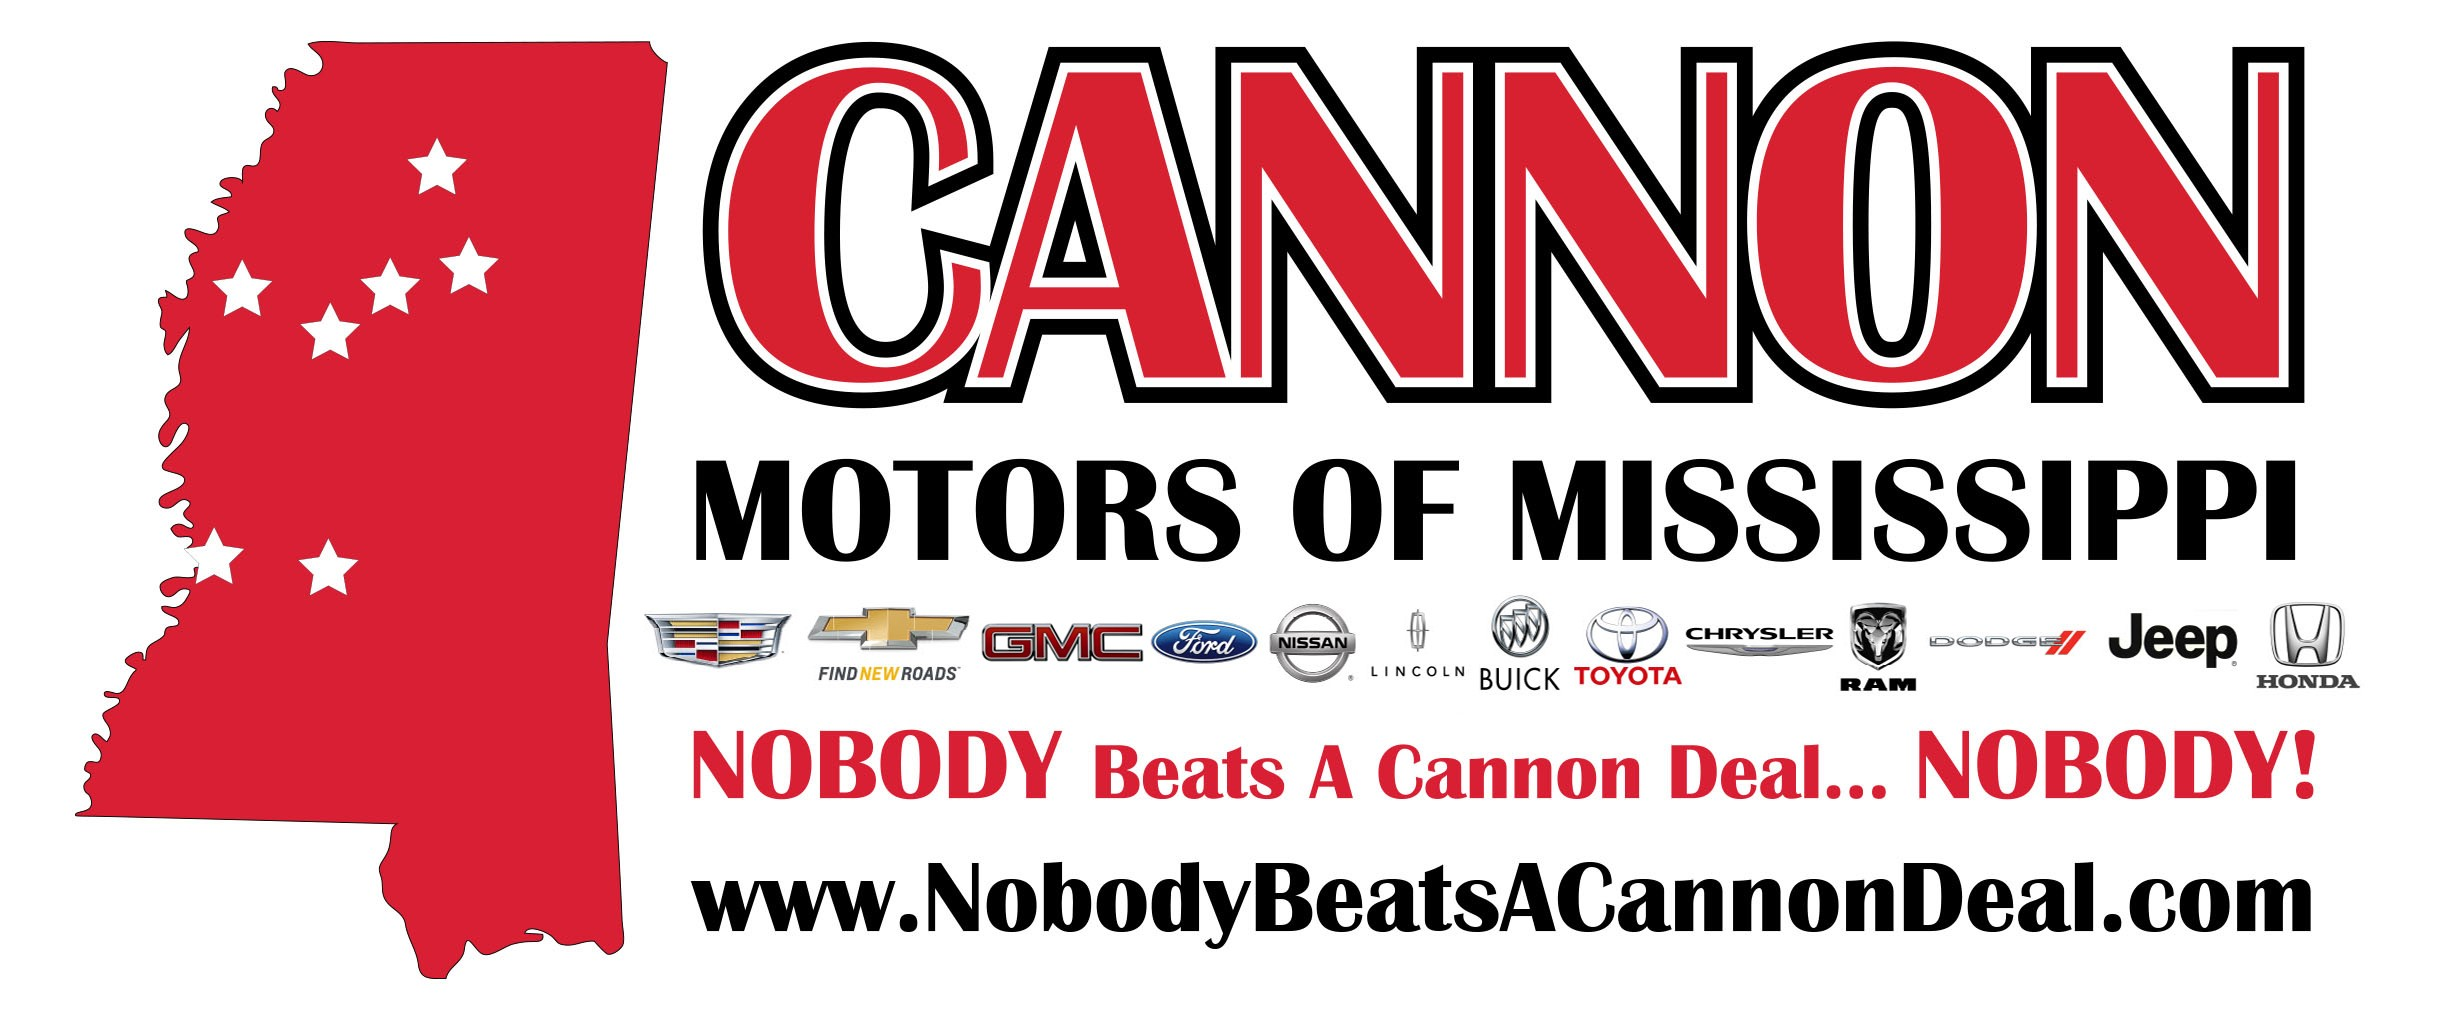 CANNON MOTORS updated Nov 2016